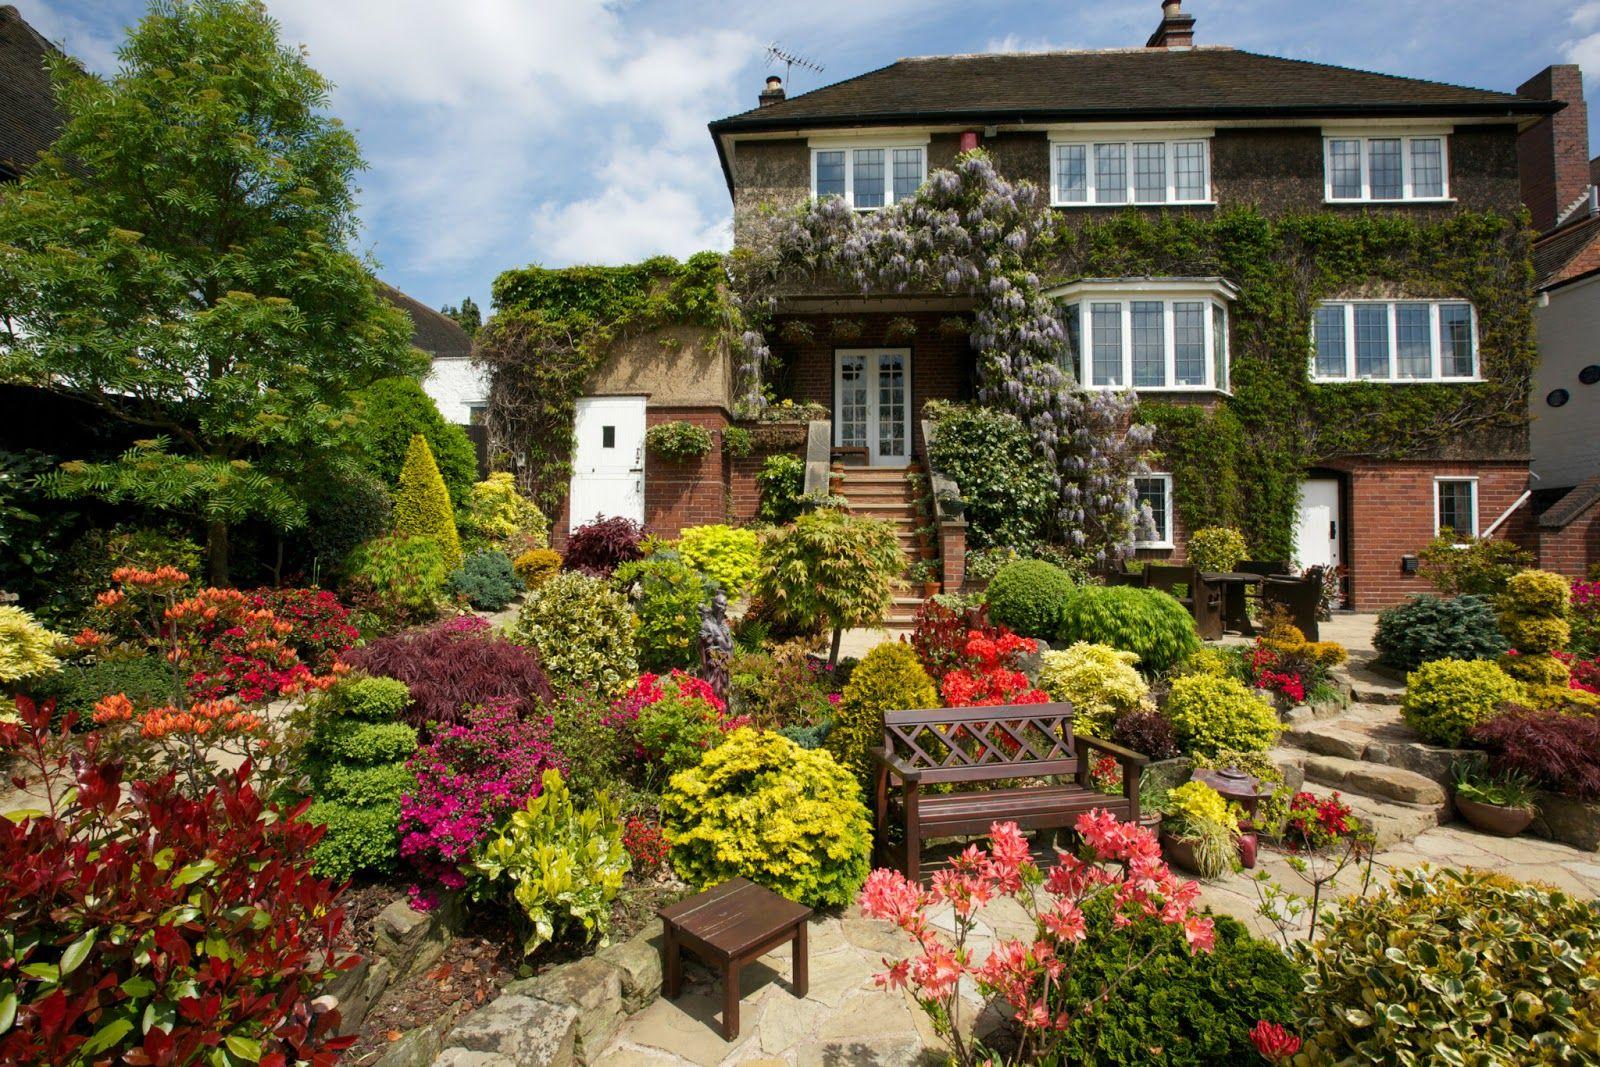 Flower Beautiful House in the World Four Seasons Garden